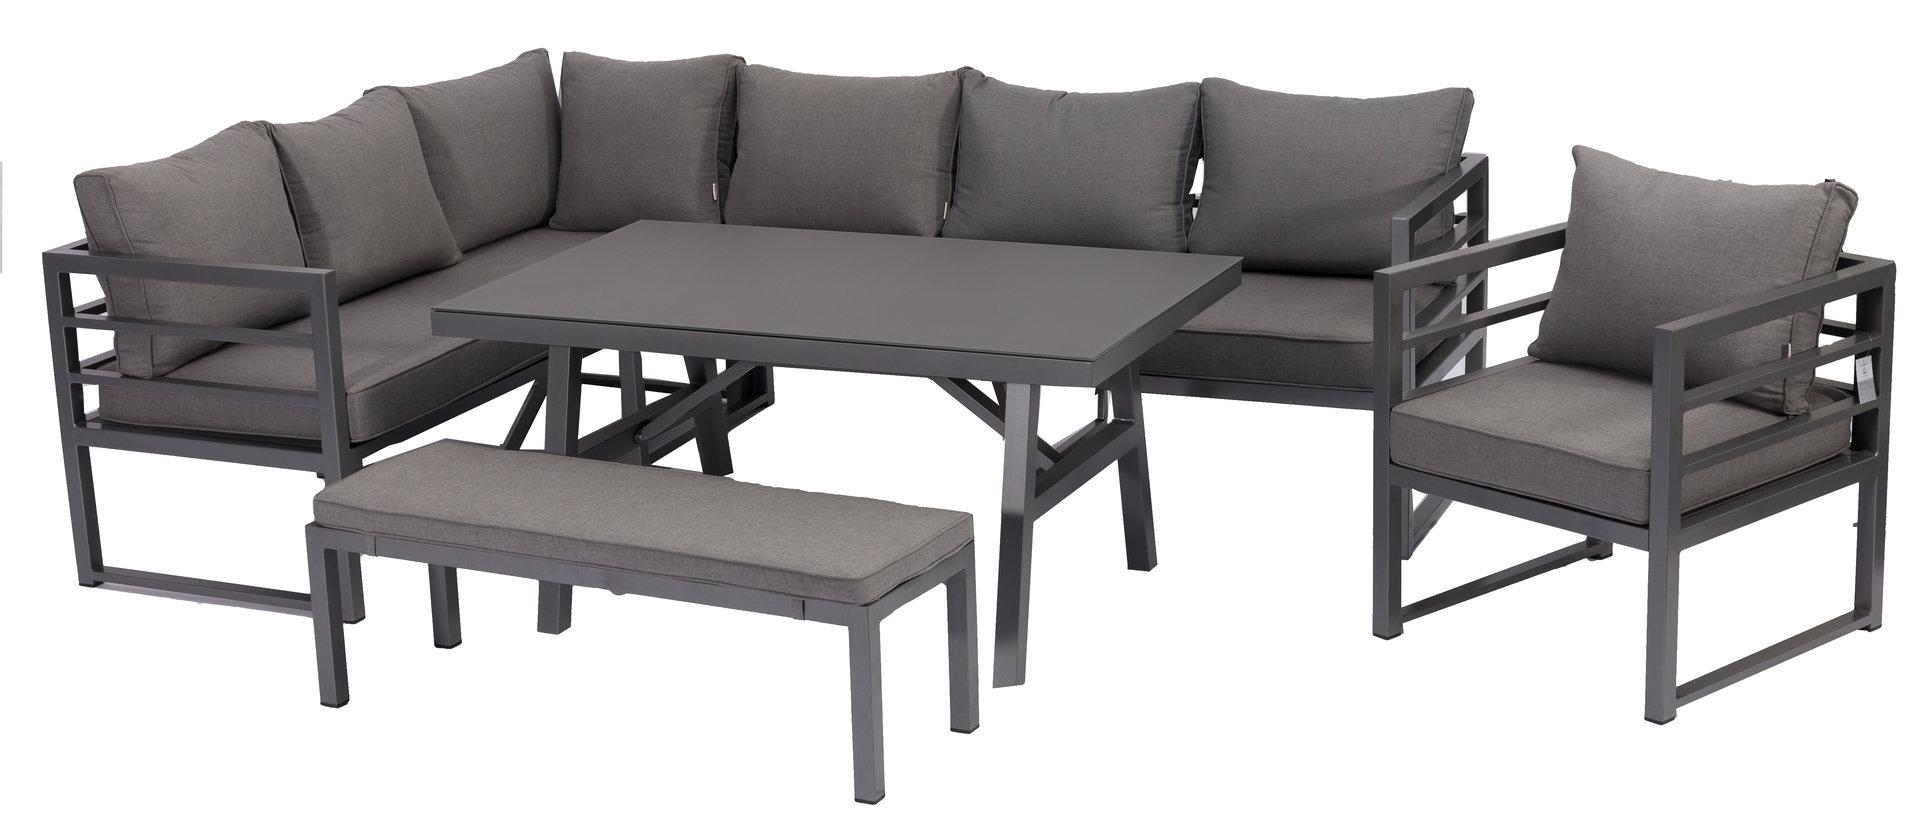 Full Size of Loungemöbel Aluminium Dining Eck Lounge Set Java Variabel Stellbar Sunbrella Bezug Garten Verbundplatte Küche Günstig Holz Fenster Wohnzimmer Loungemöbel Aluminium